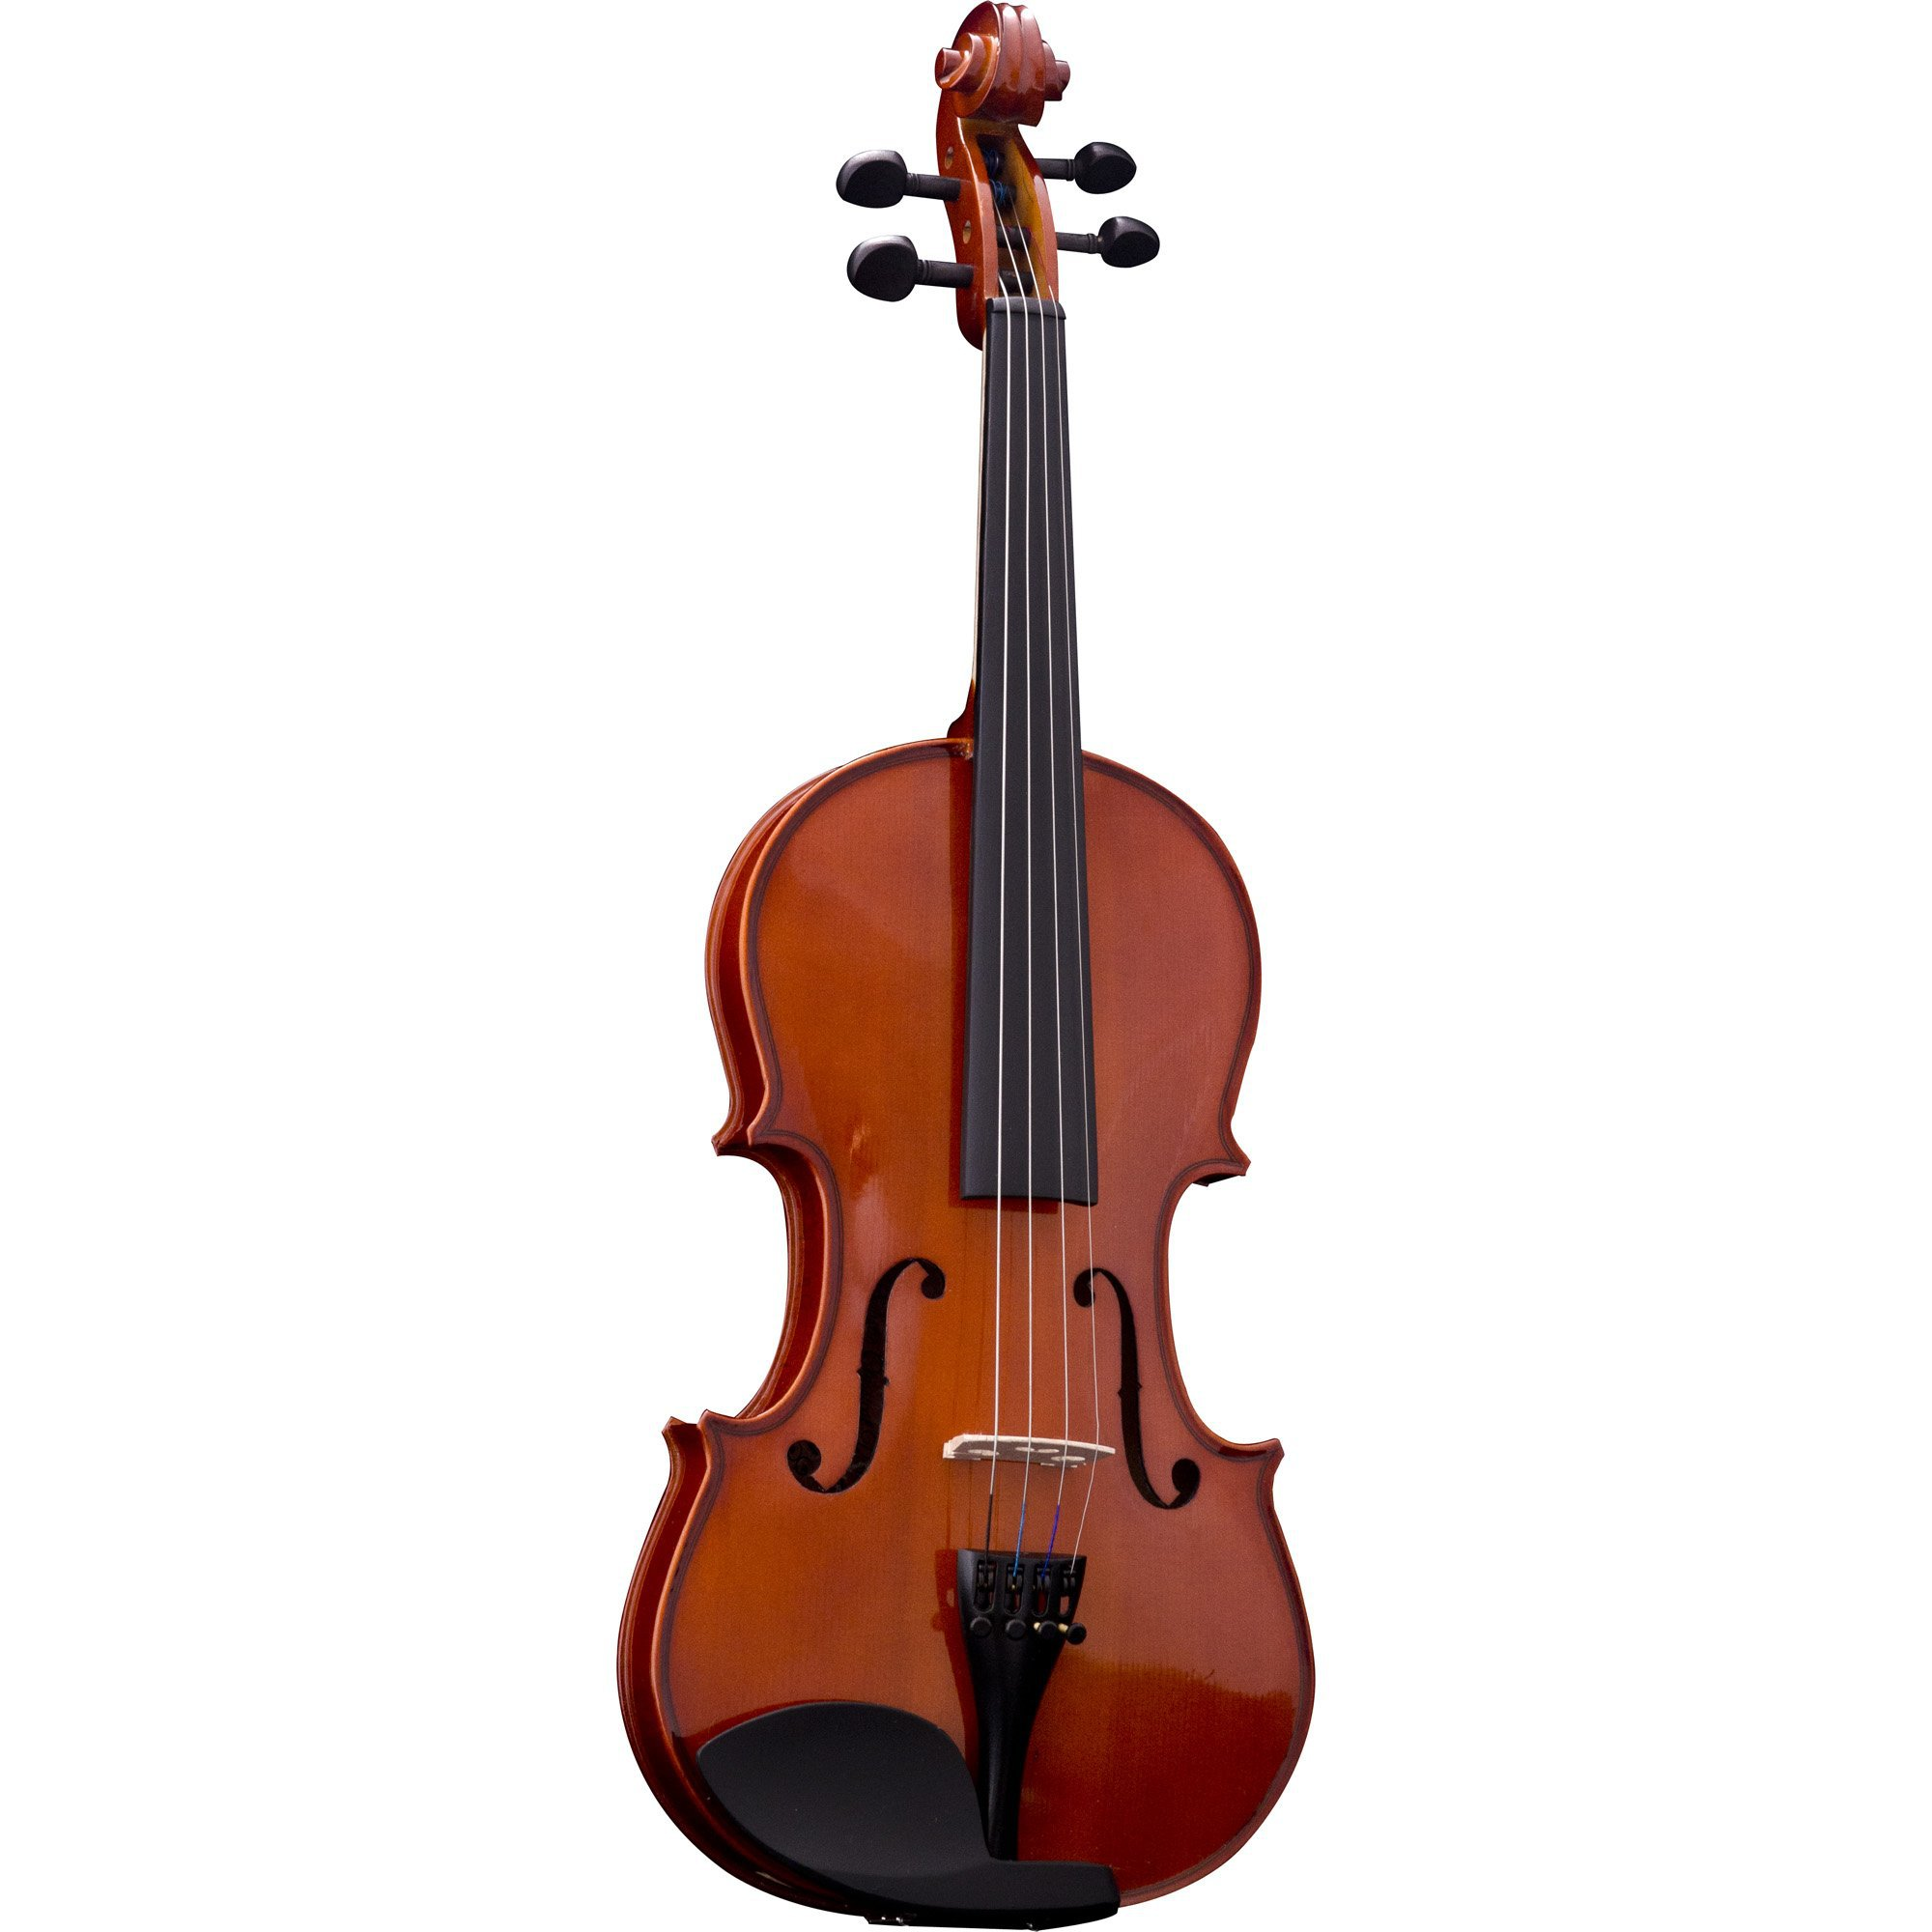 violino 4 4 va 10 oportunidade natural harmonics 42888 2000 181312